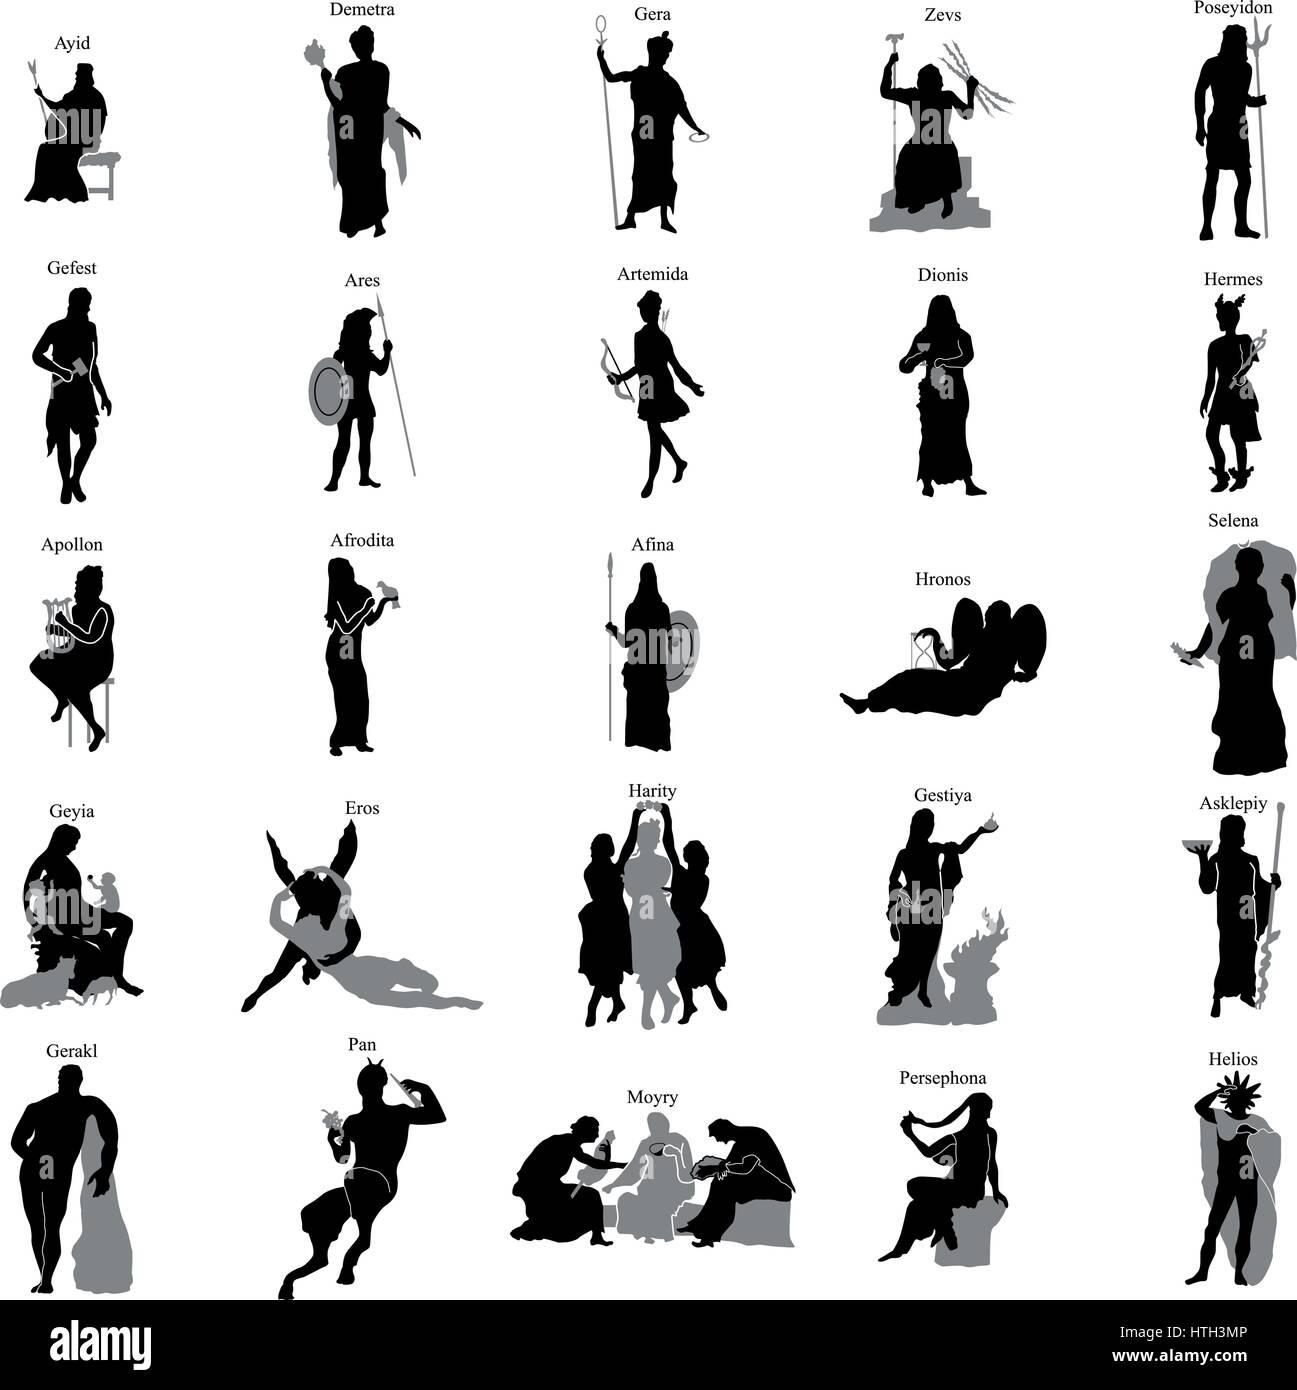 Greek gods silhouette set - Stock Image